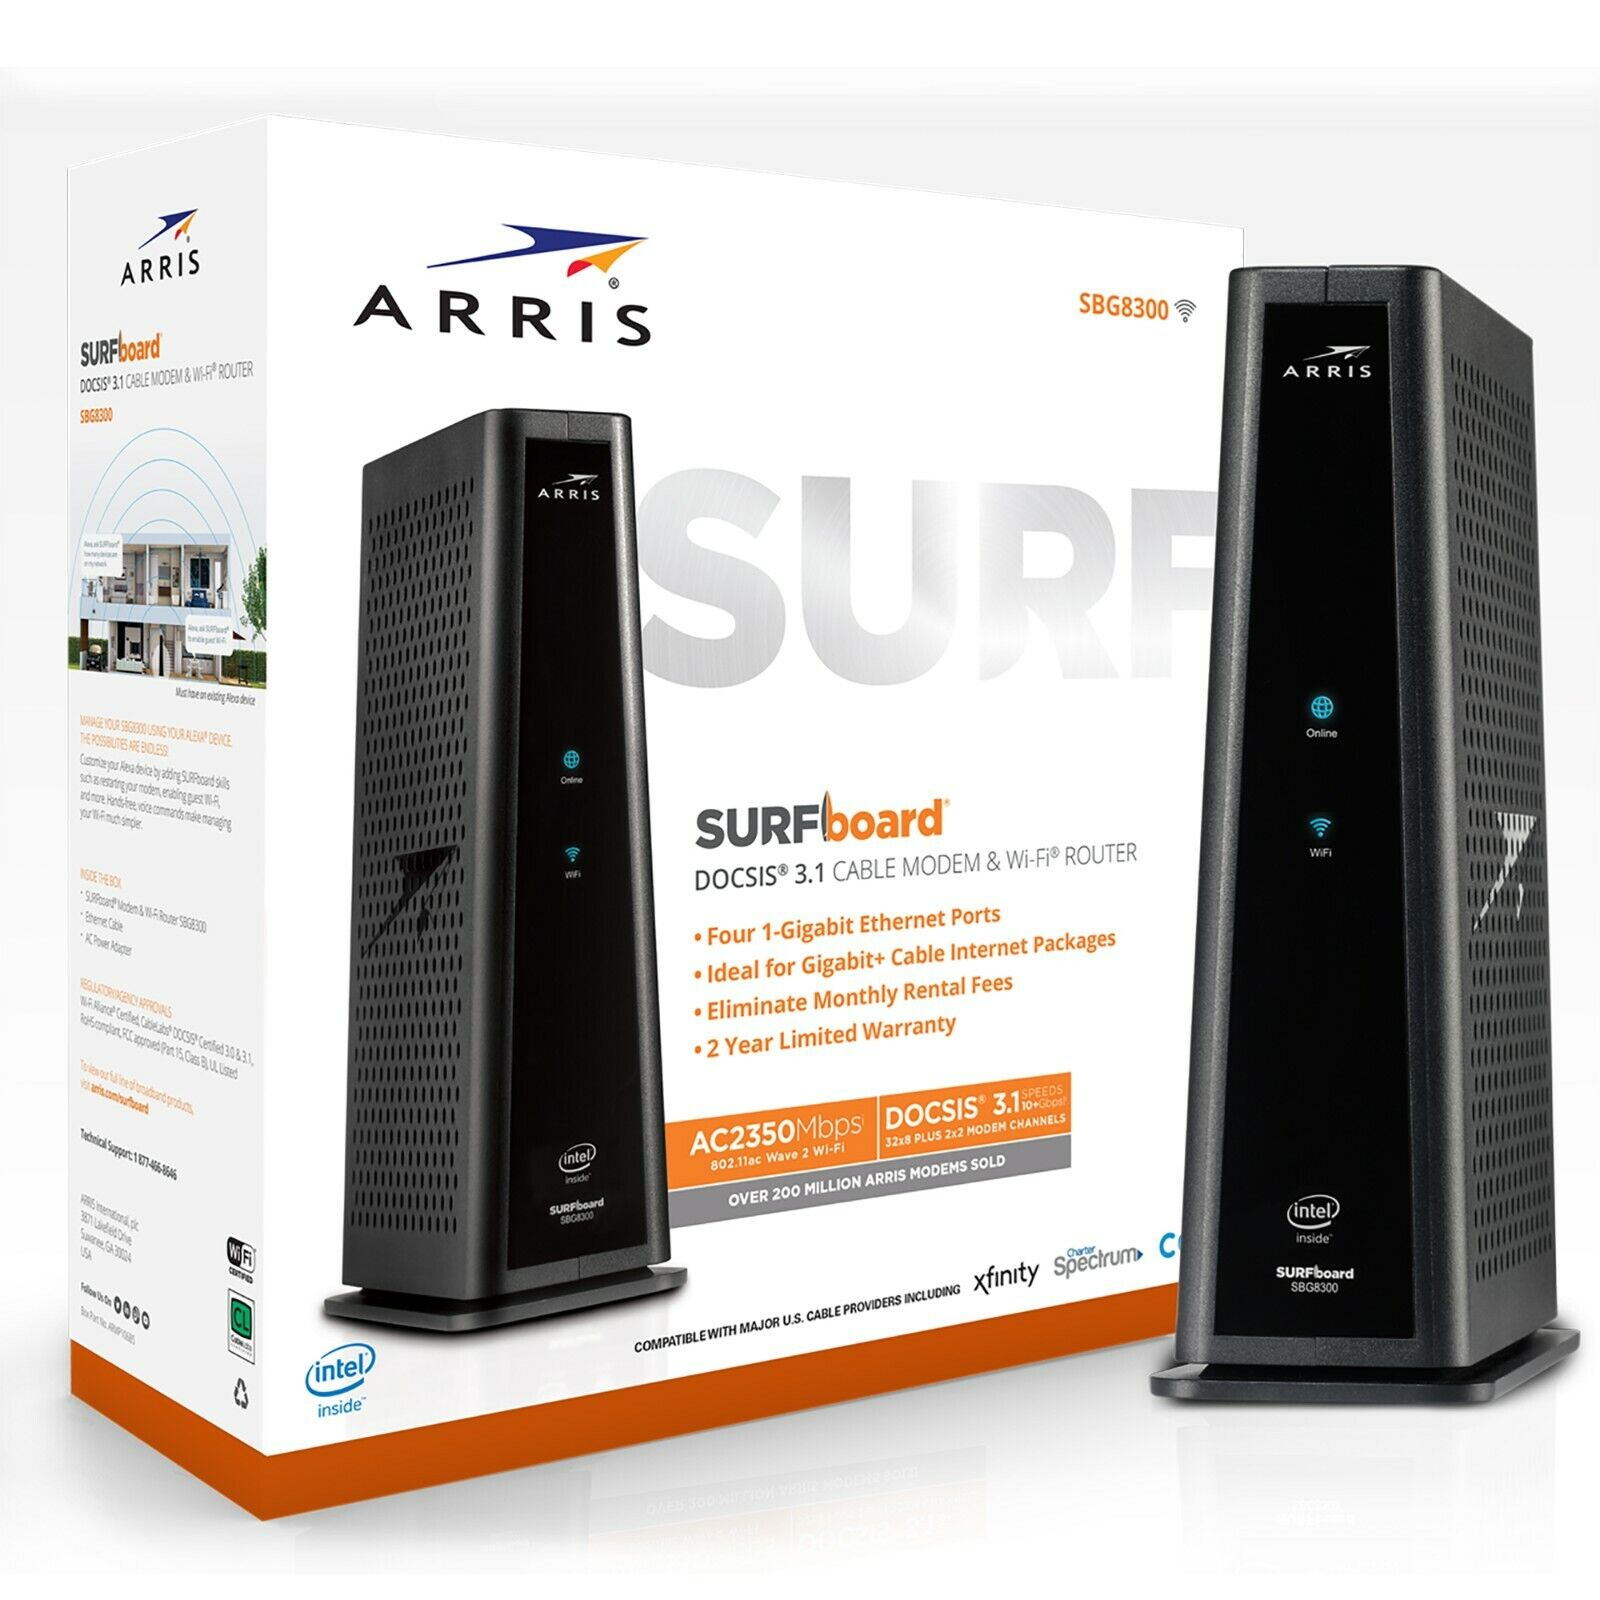 ARRIS SURFboard DOCSIS 3.1 SBG8300 Dual-Band Wi-Fi Router NE